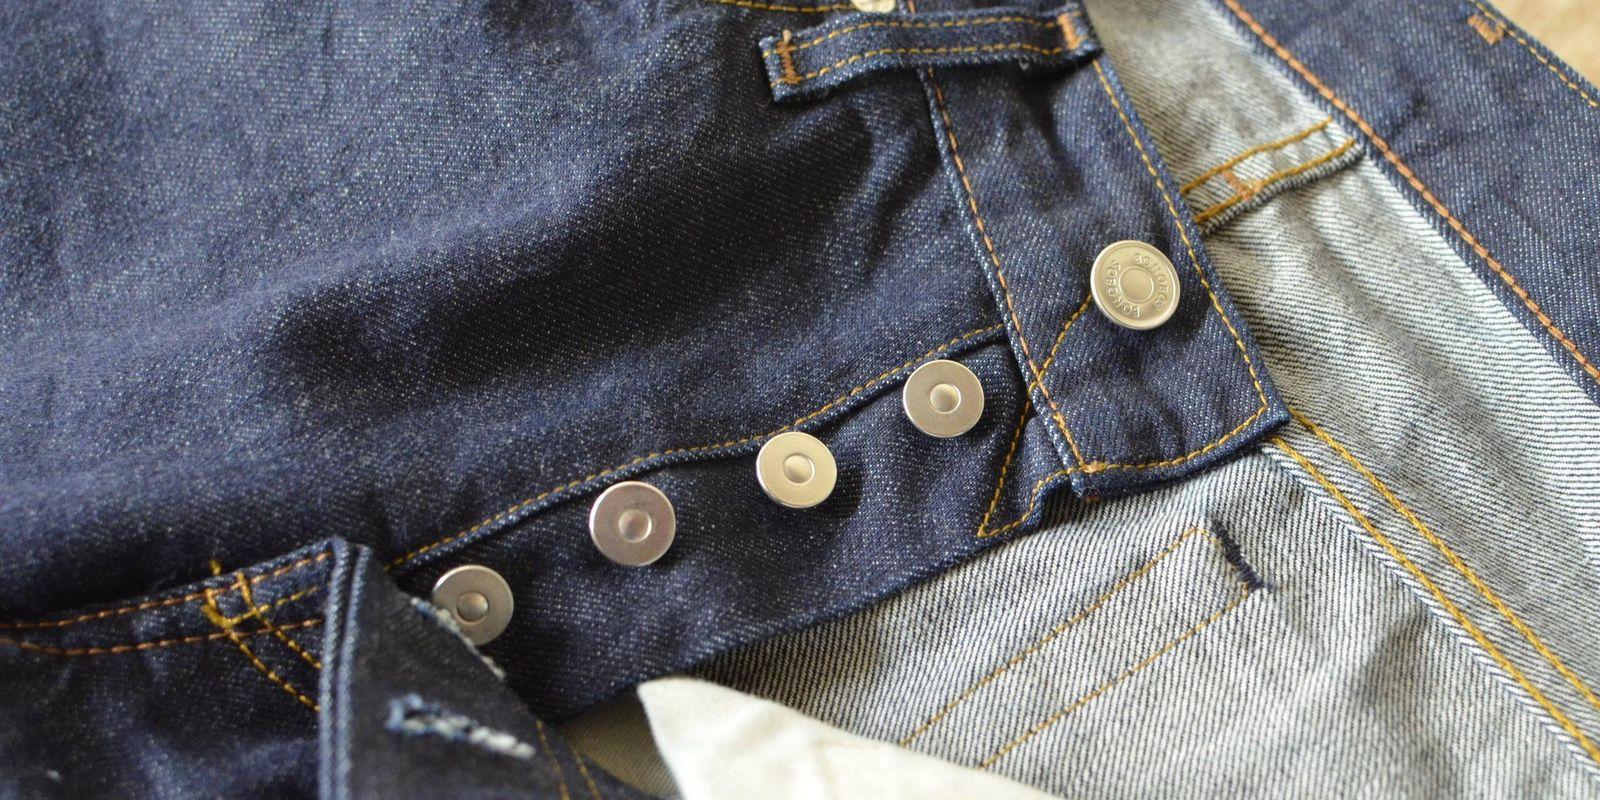 Button Fly Denim - Best Jeans for Men